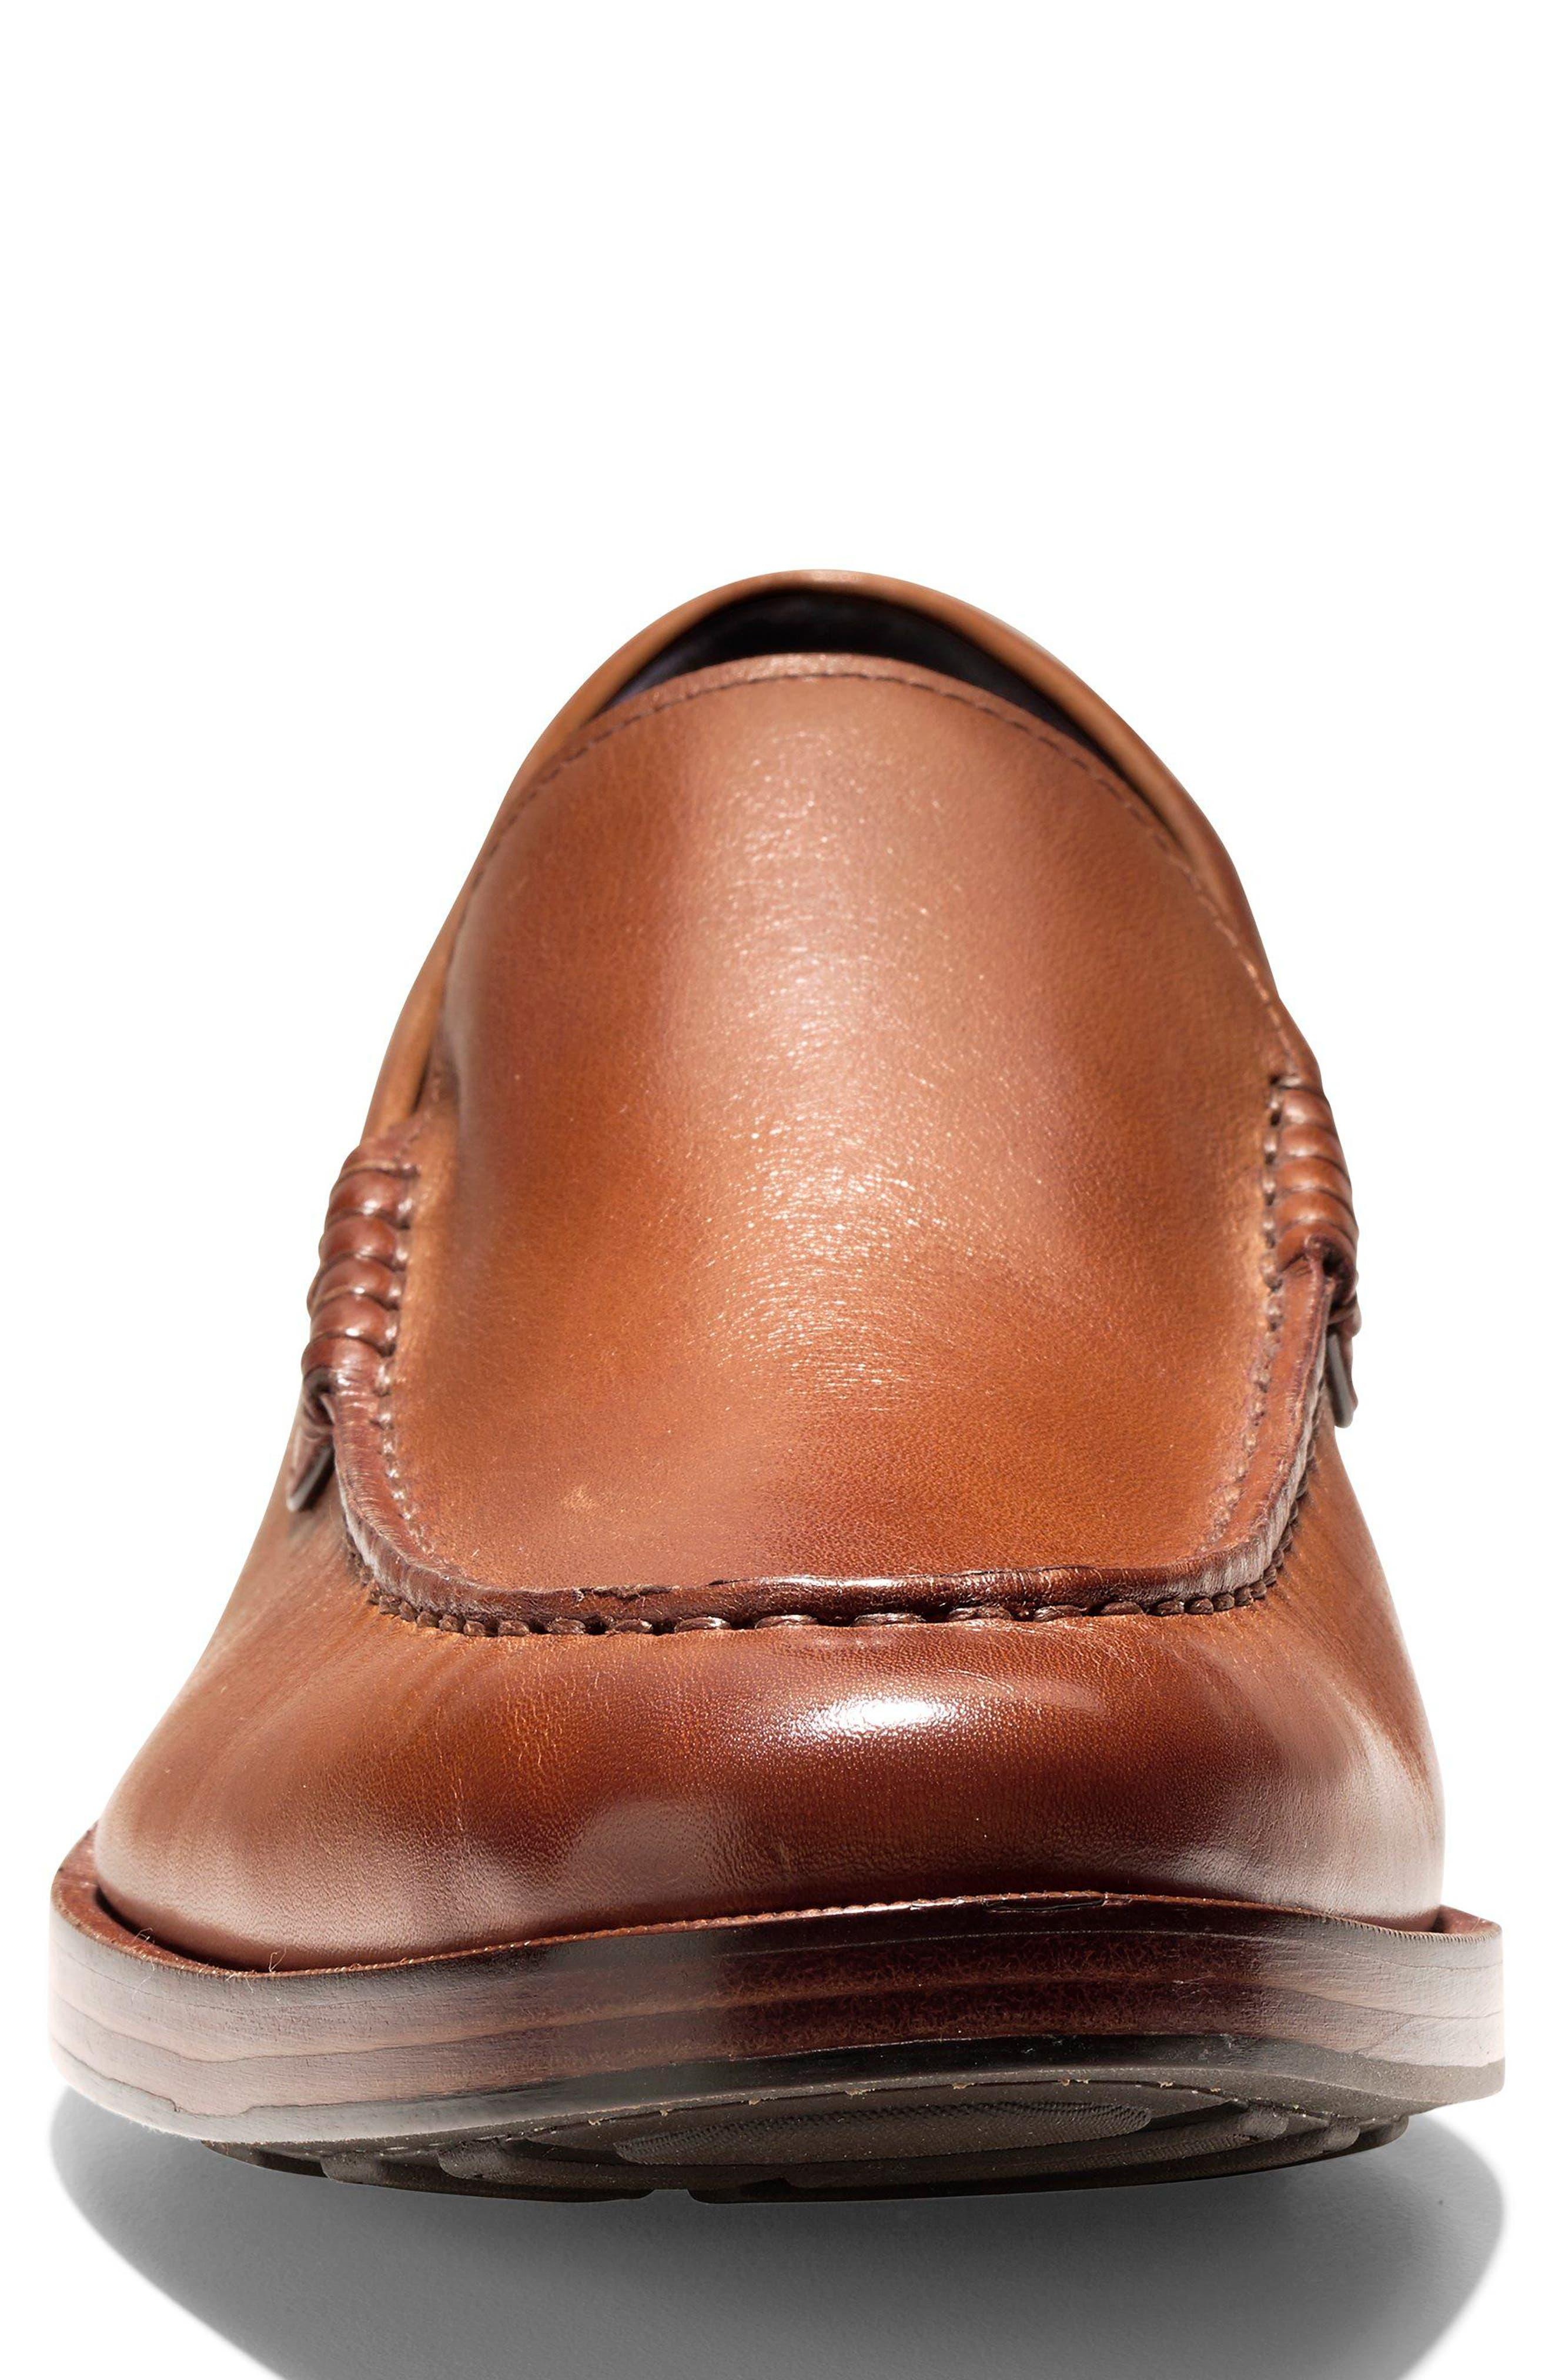 Hamilton Grand Venetian Loafer,                             Alternate thumbnail 4, color,                             British Tan